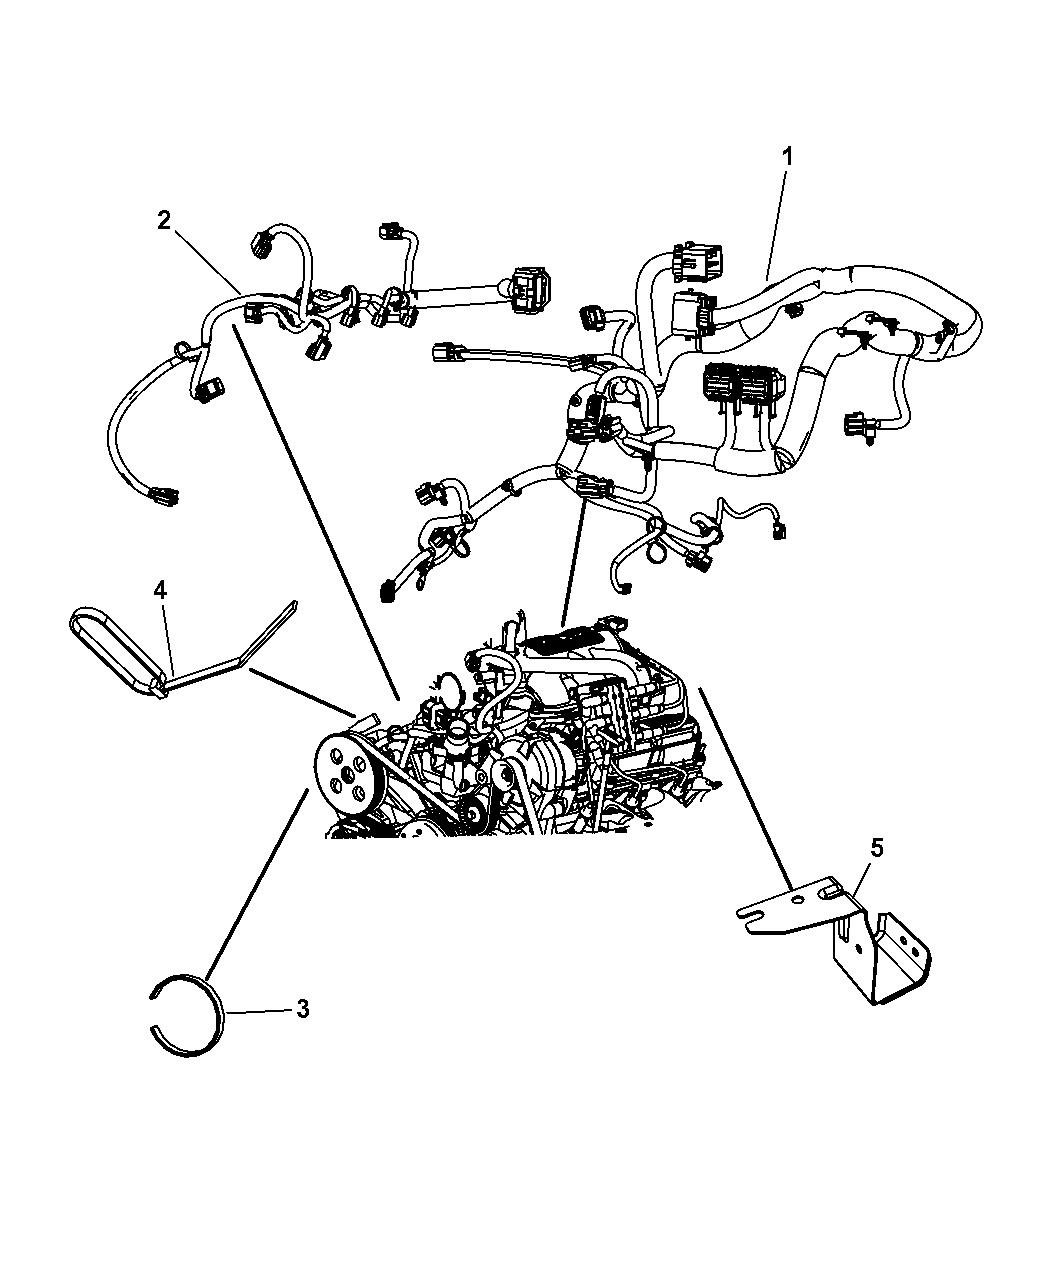 2009 Jeep Wrangler Unlimited Radio Wiring Diagram: Genuine Mopar WIRING-INJECTOR